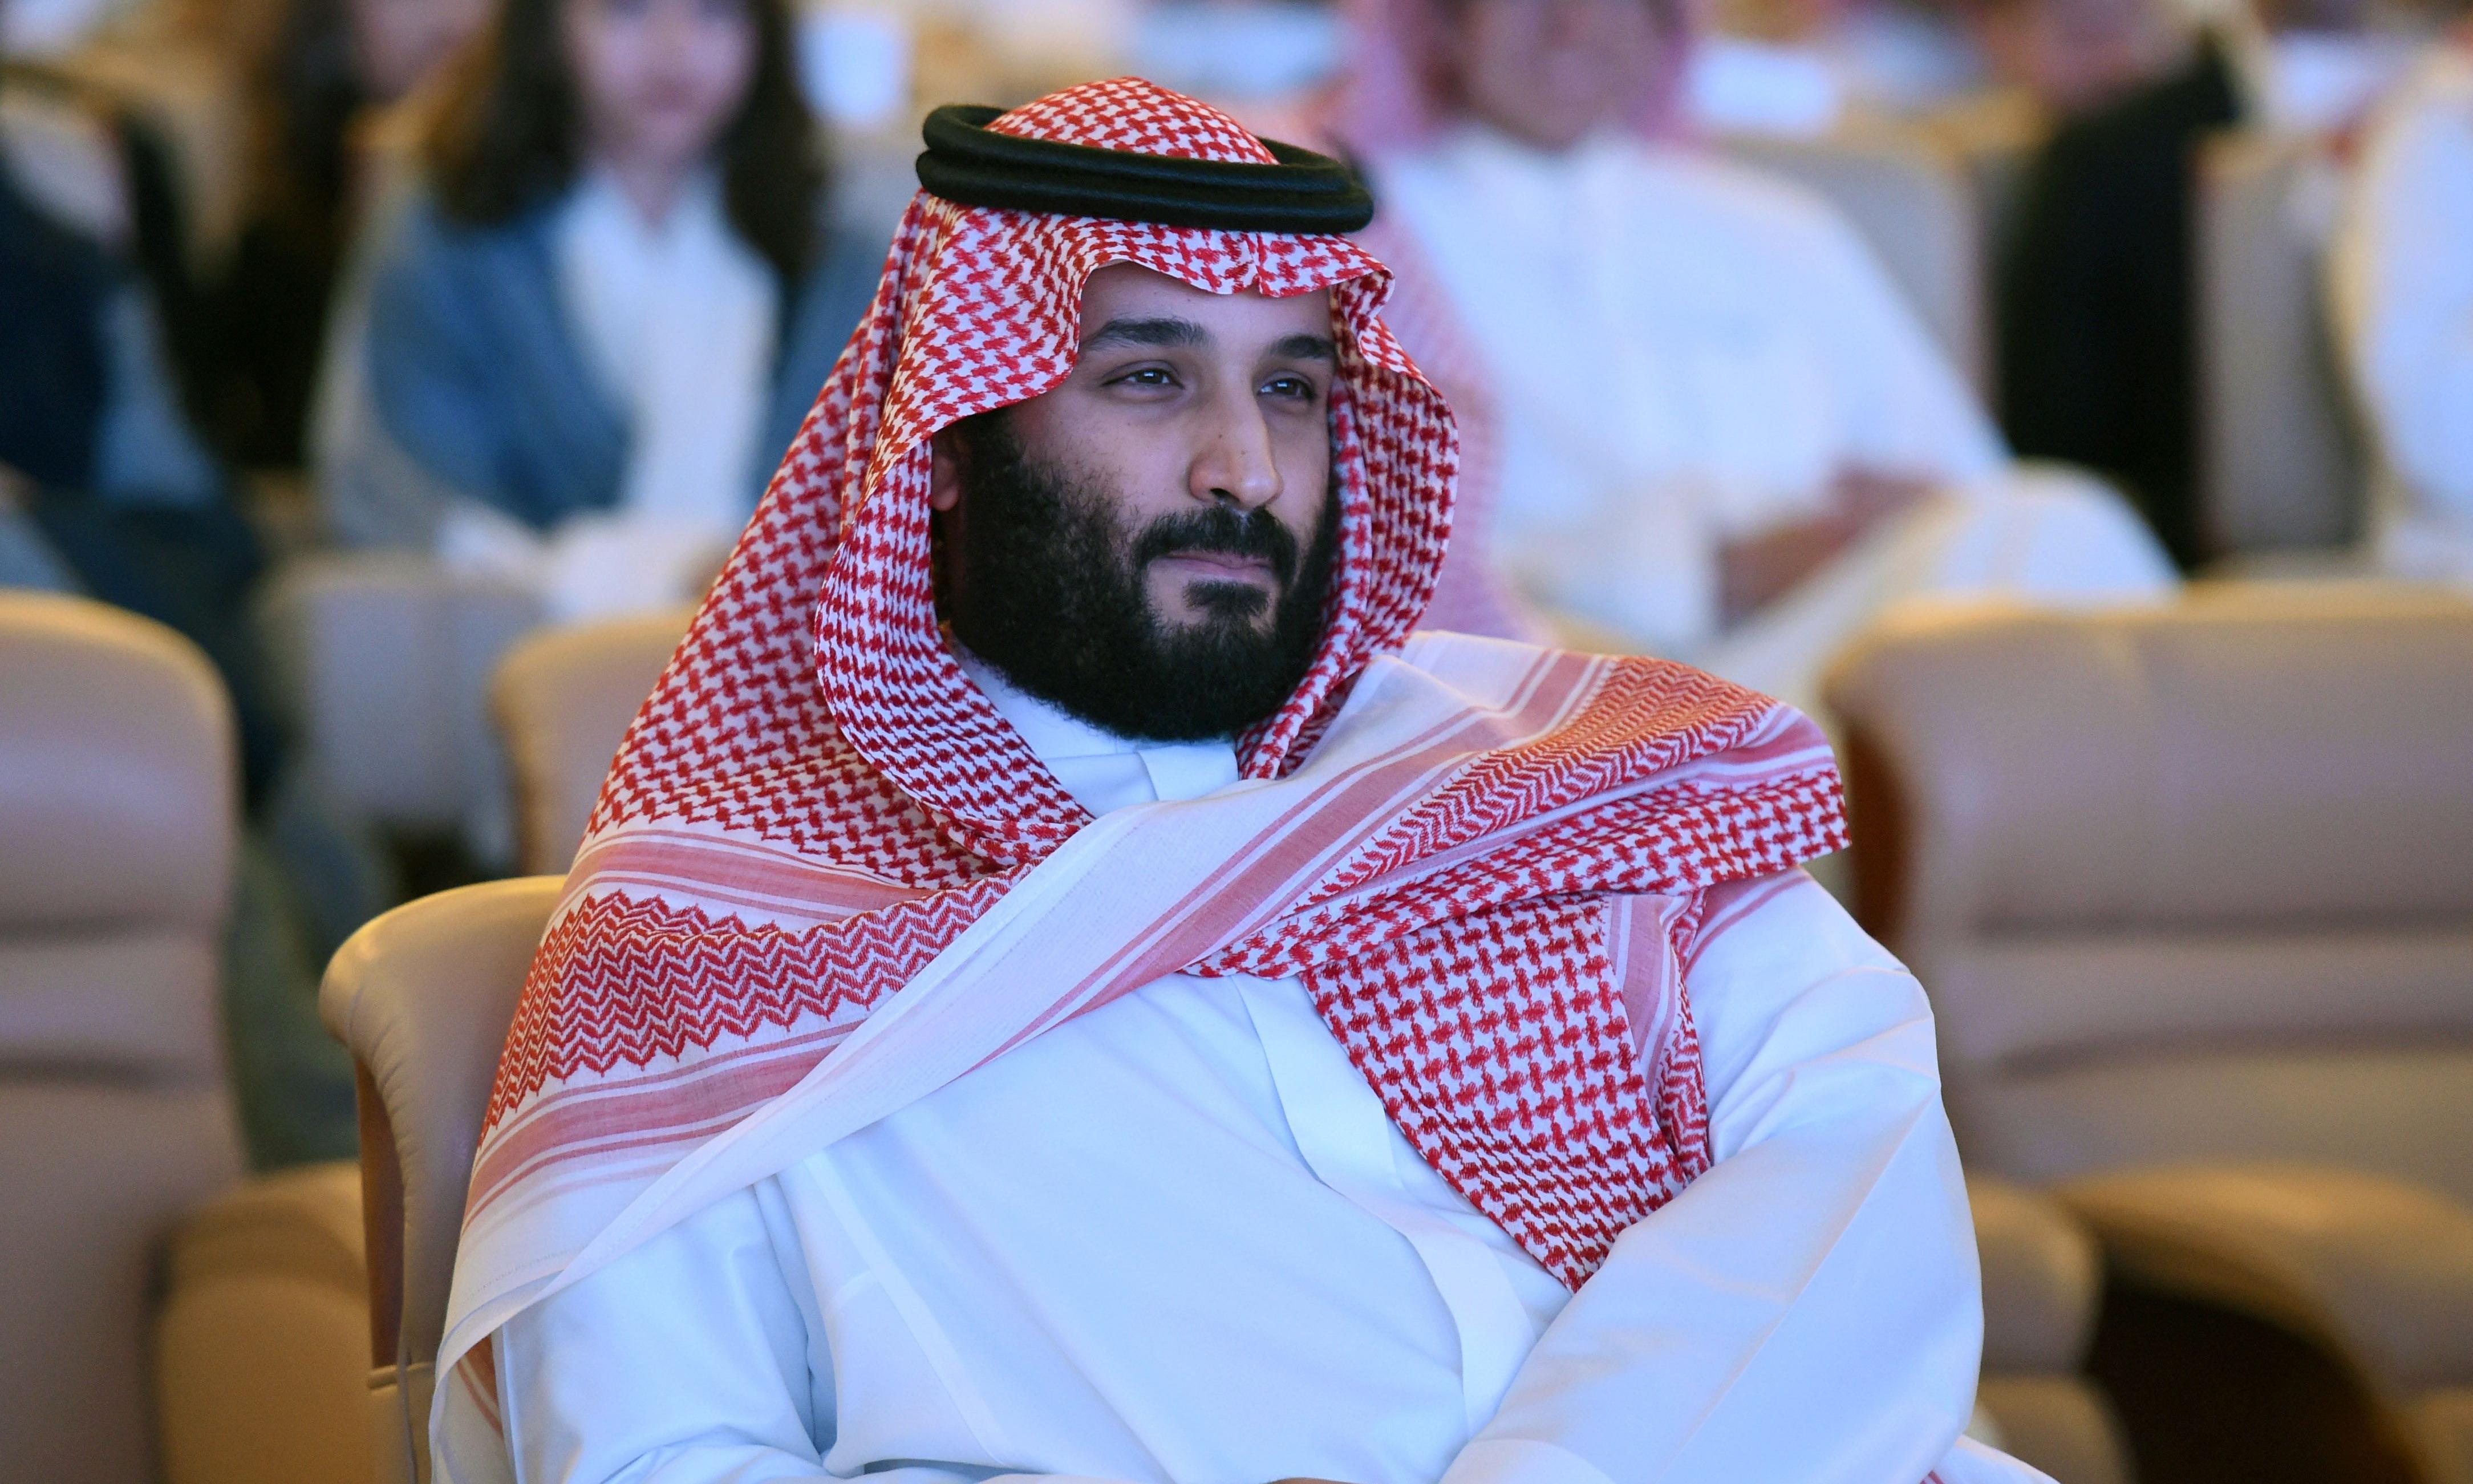 Saudi summit in crisis as Khashoggi case prompts mass withdrawals